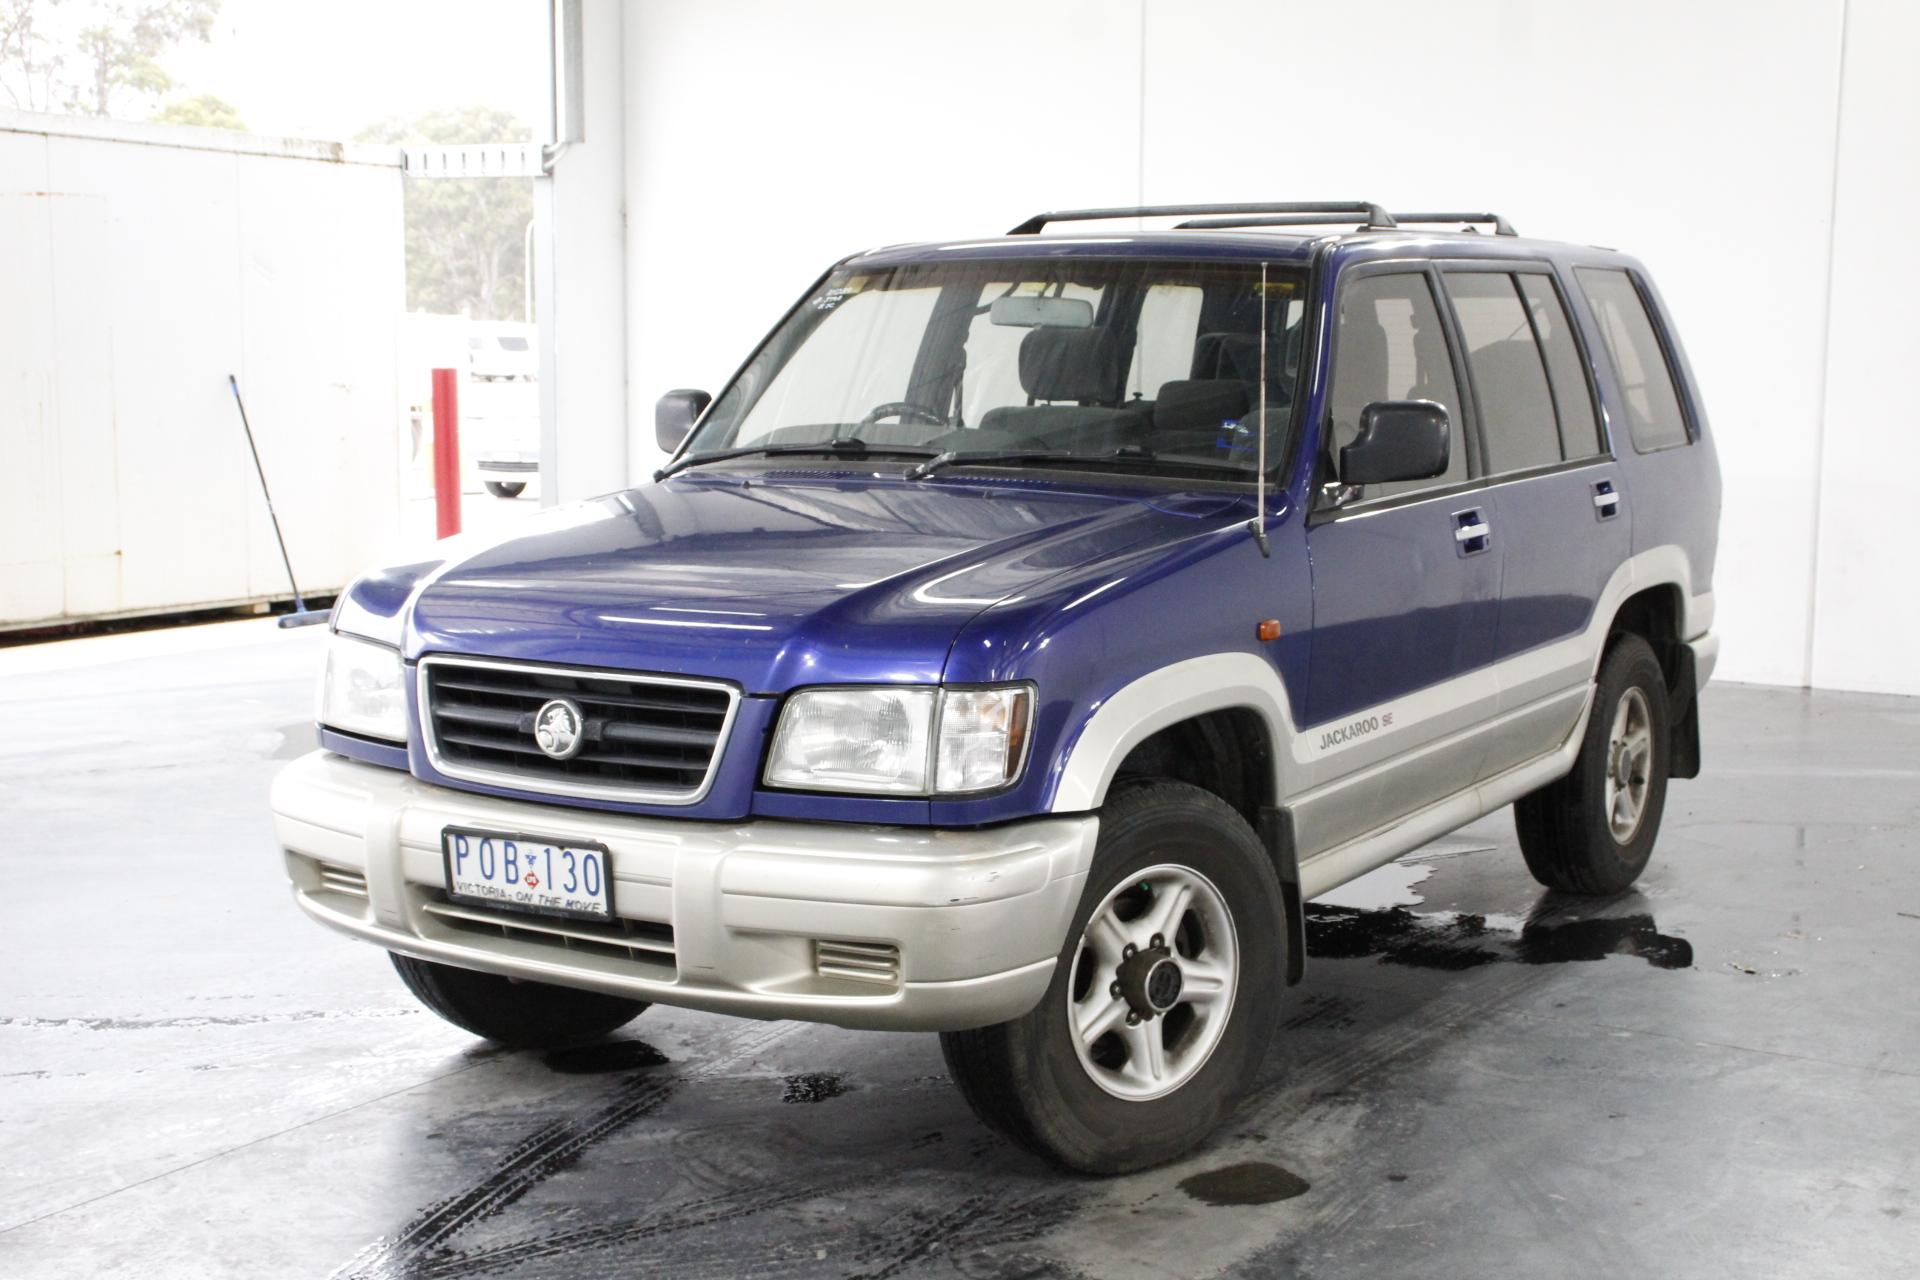 1999 Holden Jackaroo SE LWB (4x4) Automatic 7 Seats Wagon